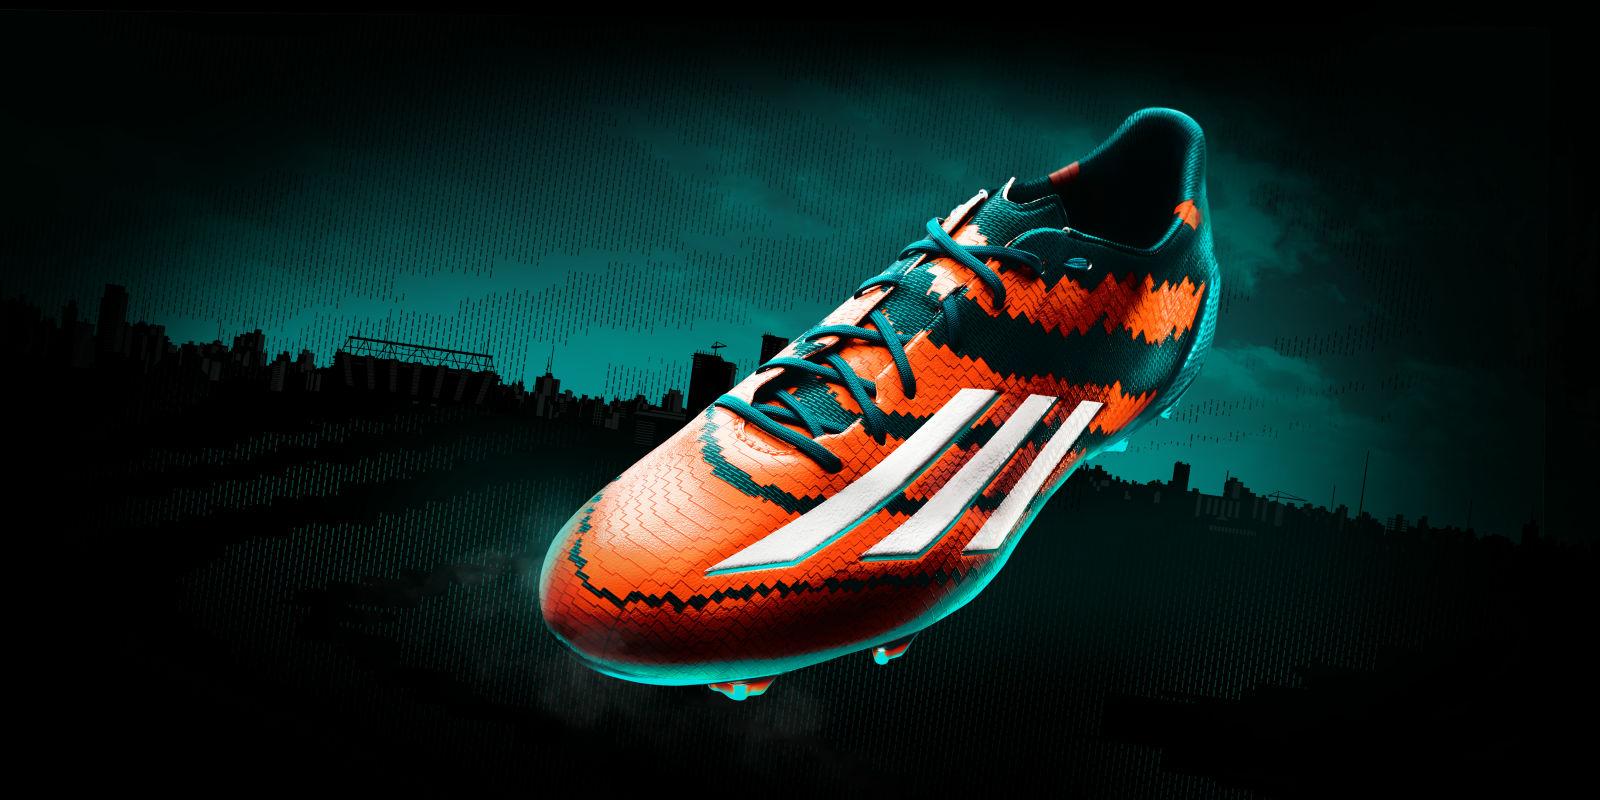 Messi Adidas cleats 61c3d0b31